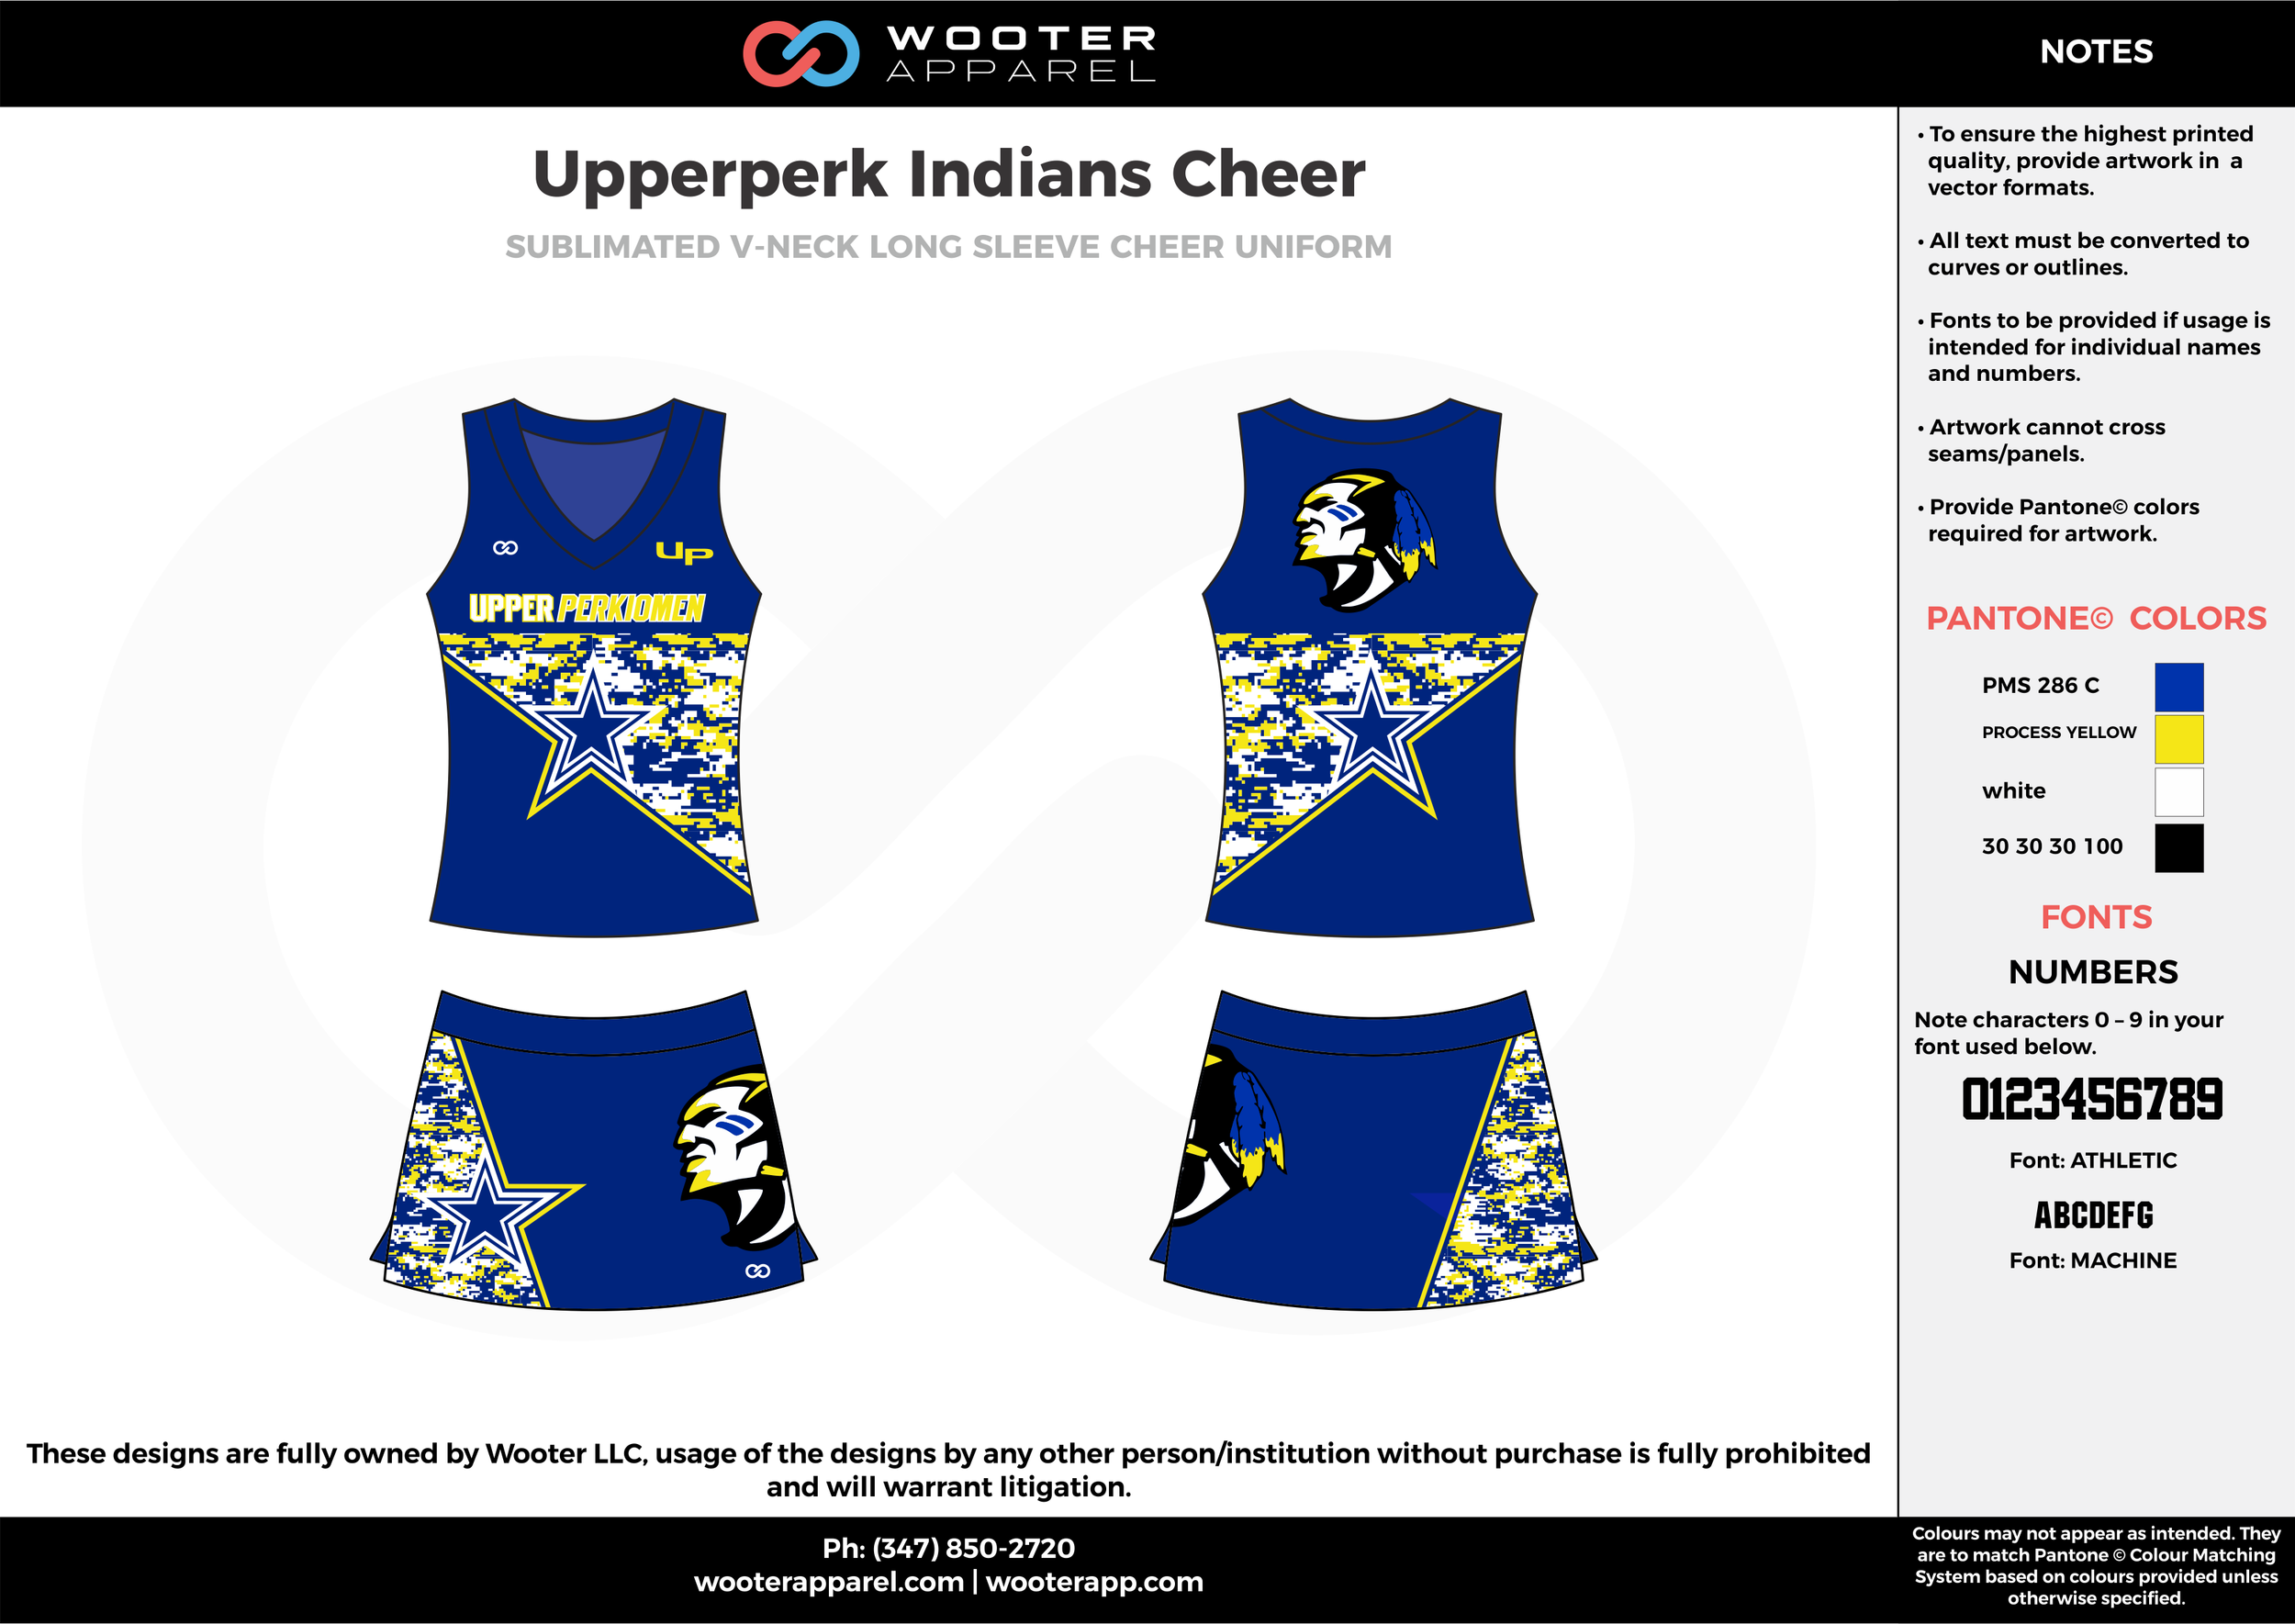 Upperperk Indians Cheer blue yellow white cheerleading uniforms, top, and skirt